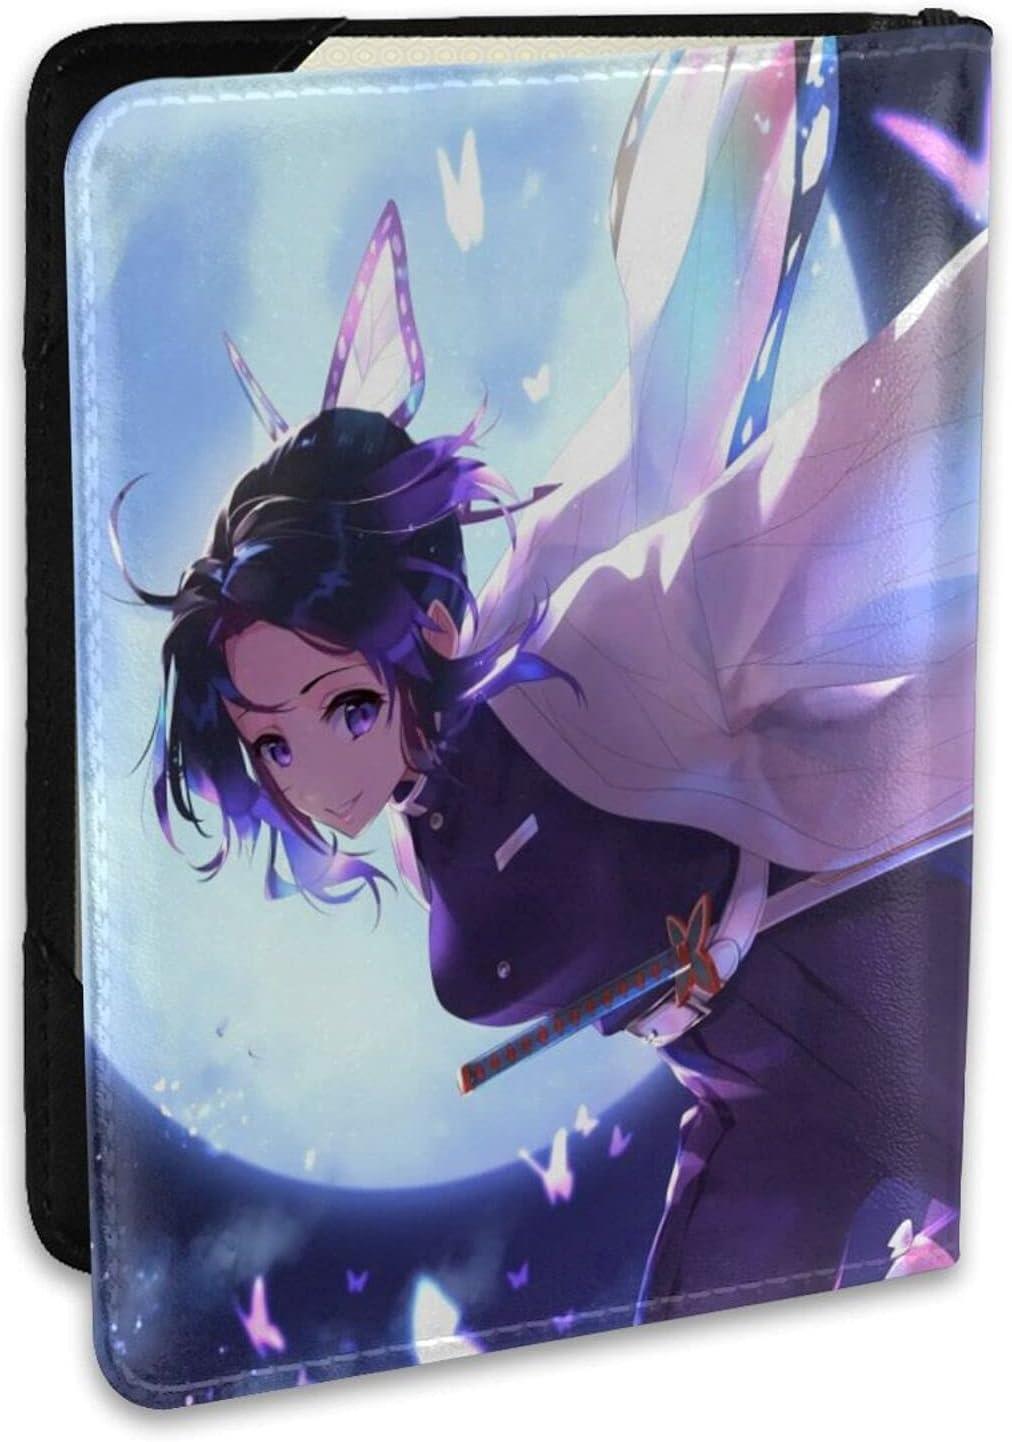 Excellent Anime Demon Credence Slayer leather wallet wa card Shinobu credit Kochou